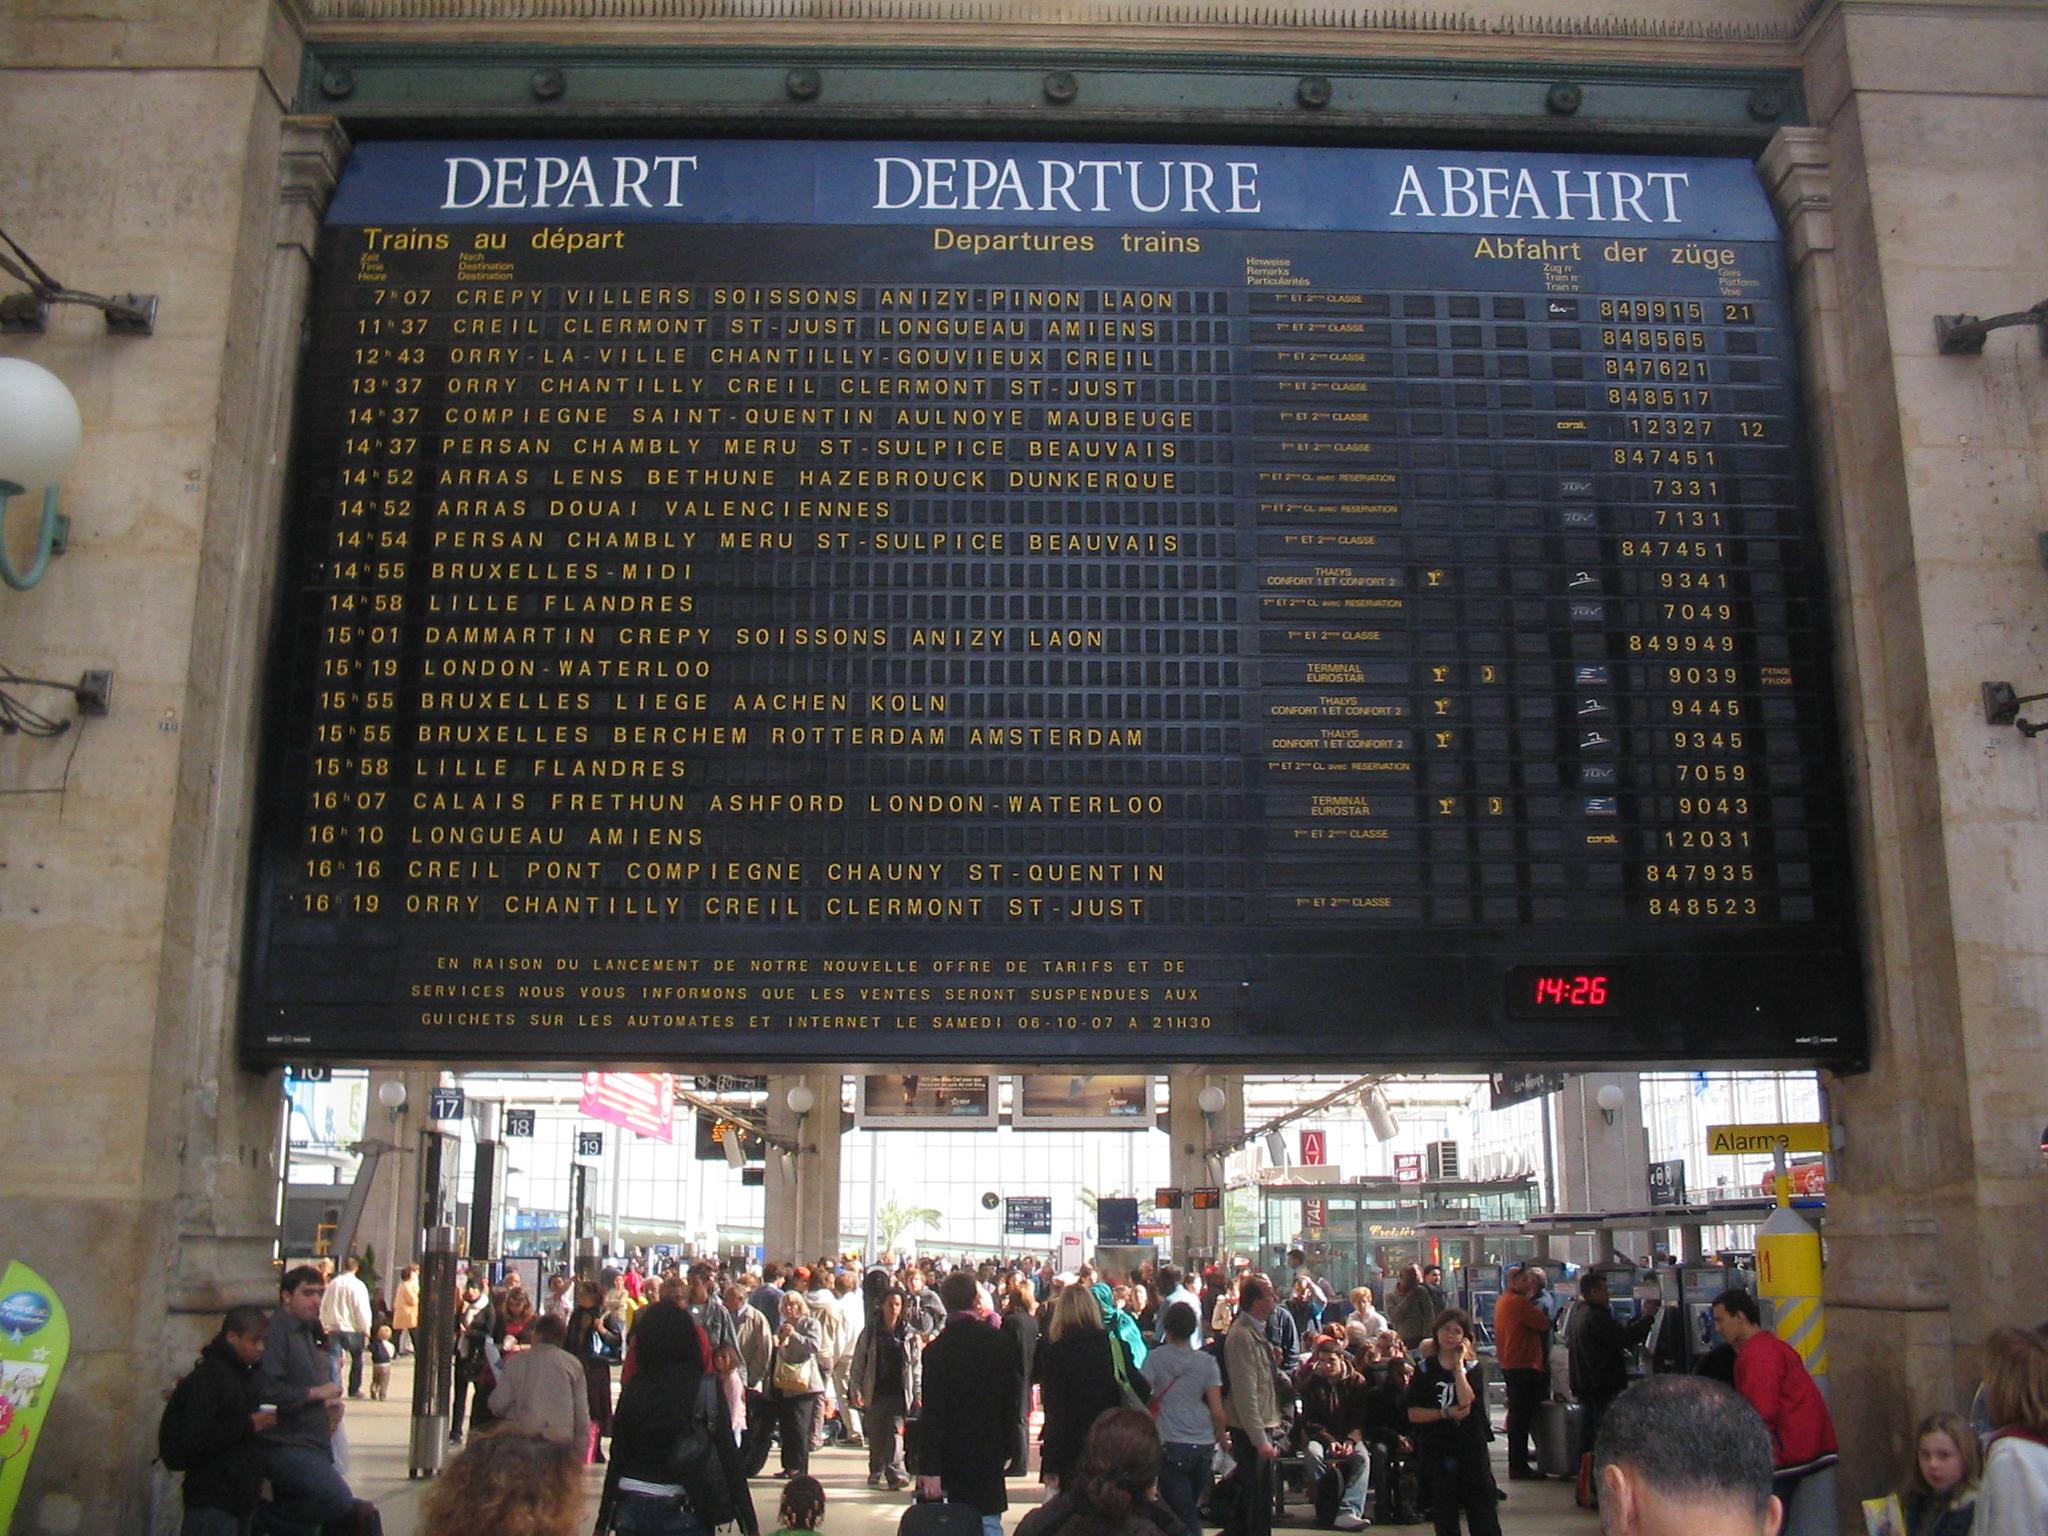 File:Gare du Nord Fallblattanzeiger Departure-board.JPG ...